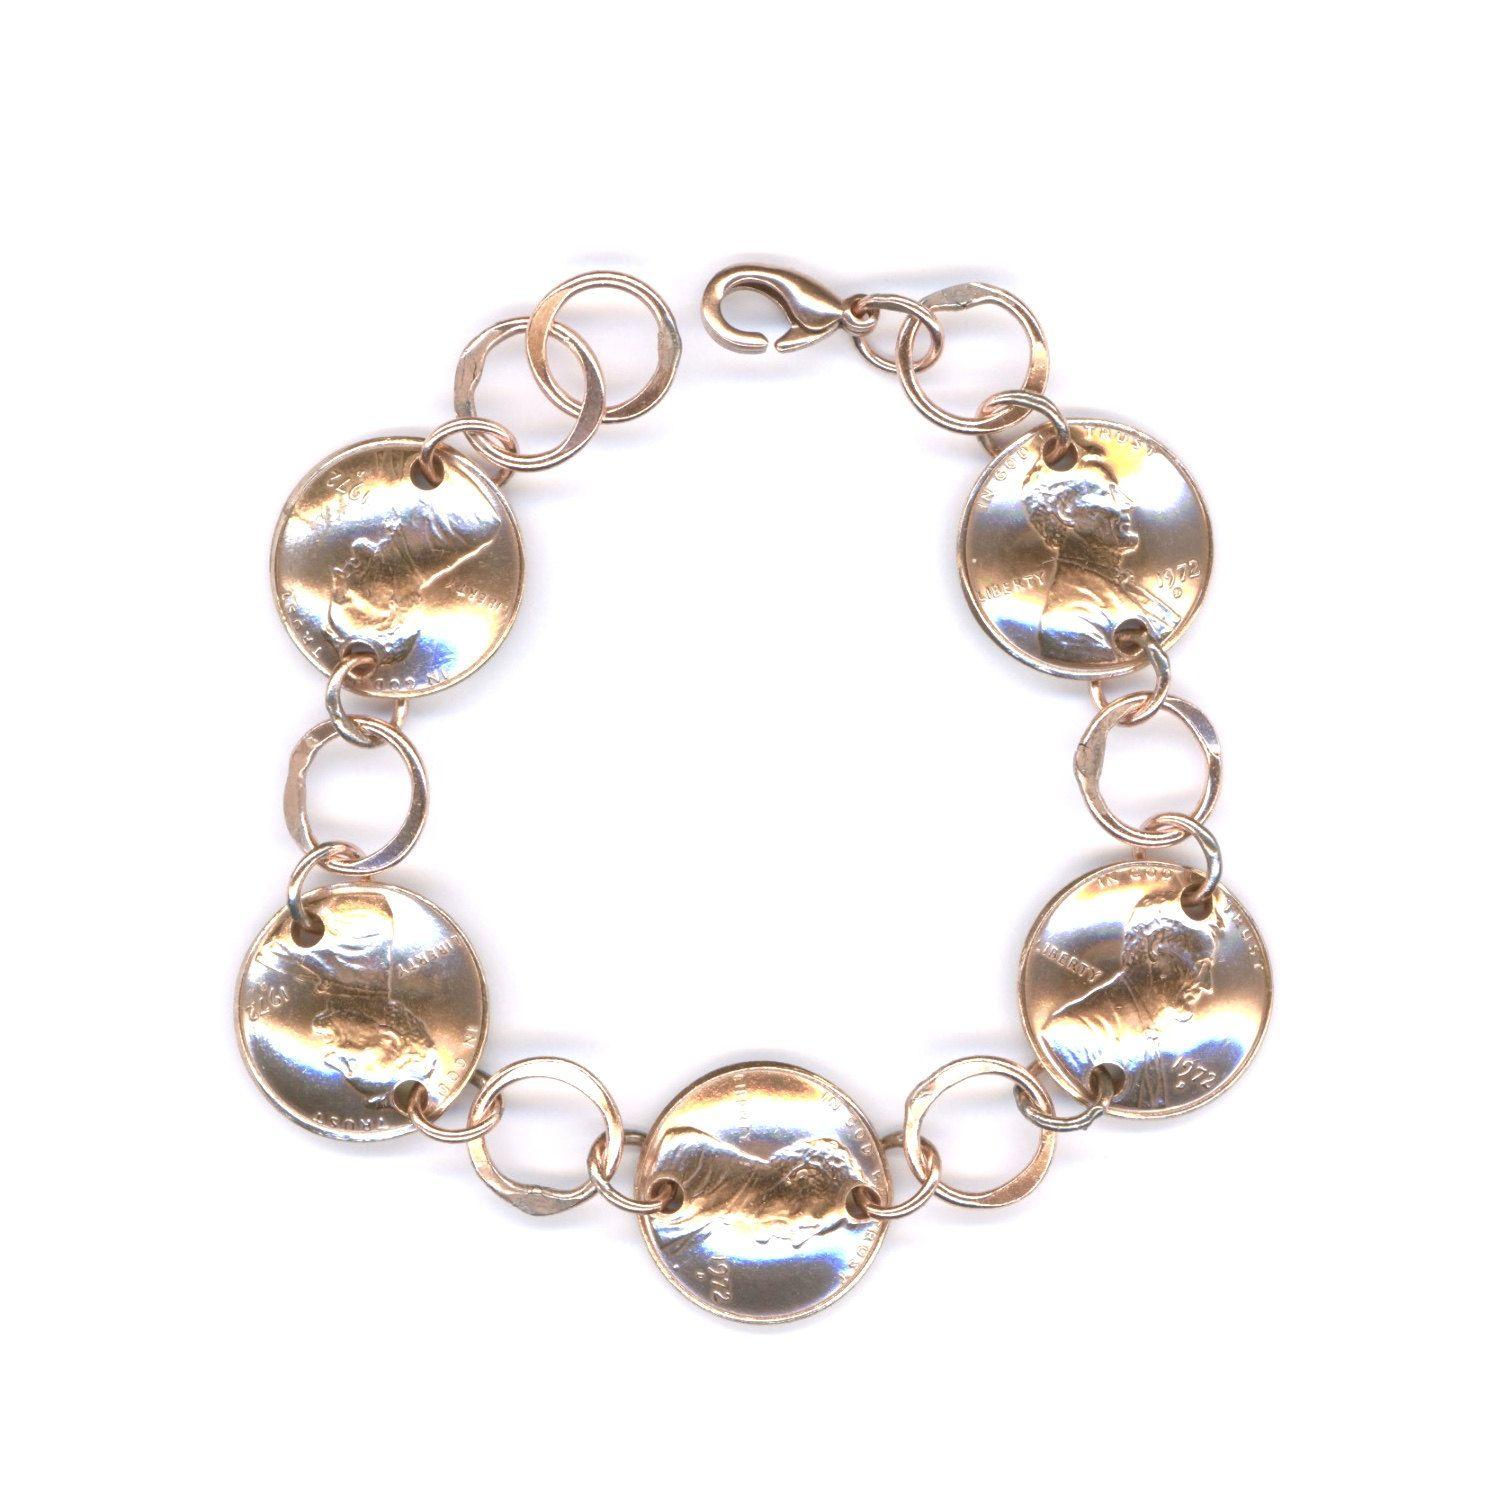 1972 penny bracelet jewelry 45th birthday gift for women